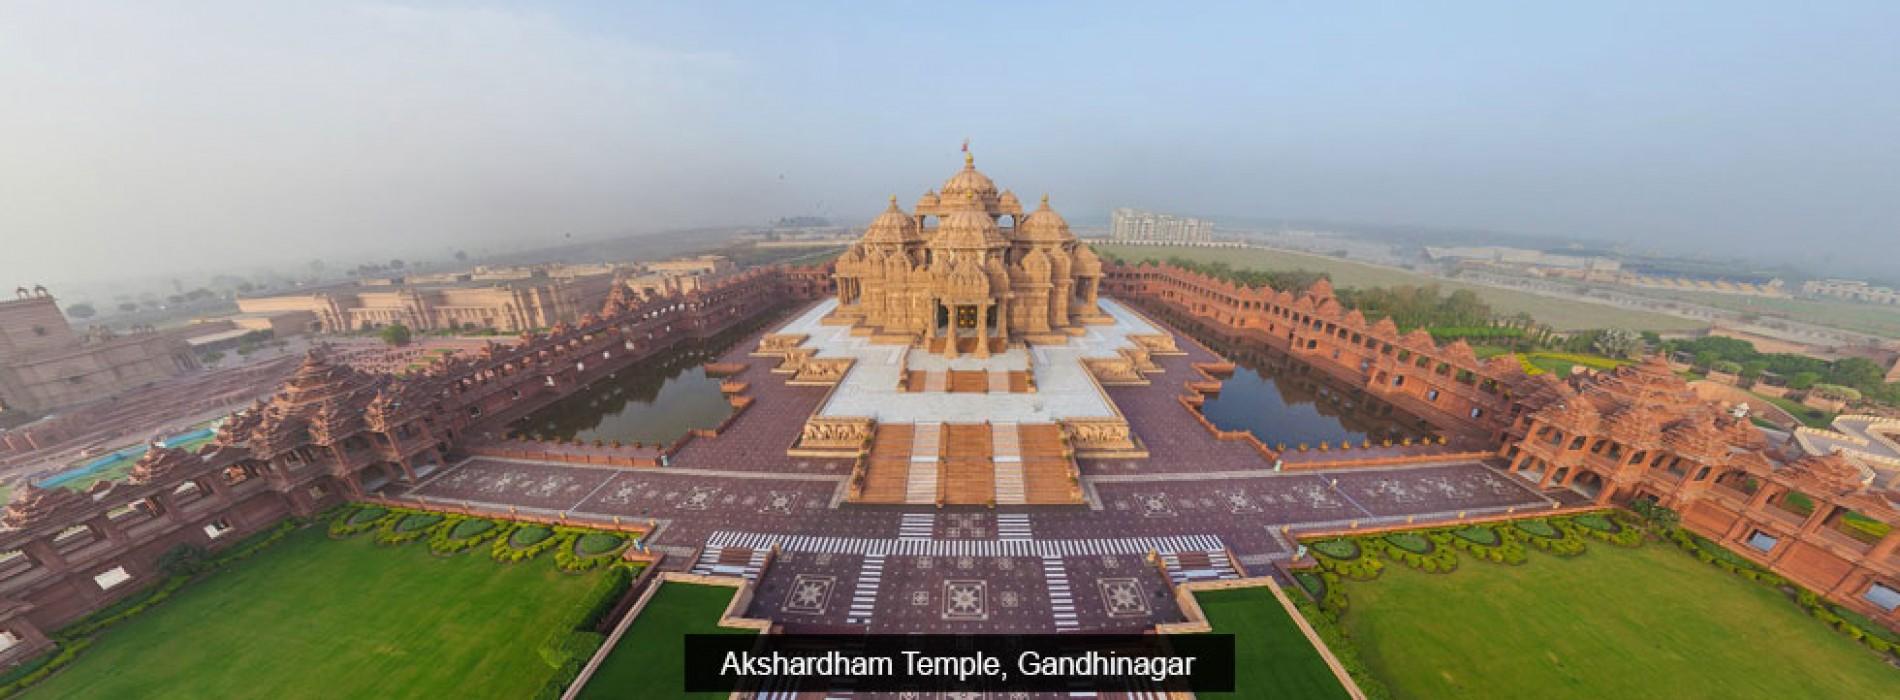 Popular Heritage Monuments Of Gujaratpopular Heritage Monuments Of Gujarat Tnhglobal